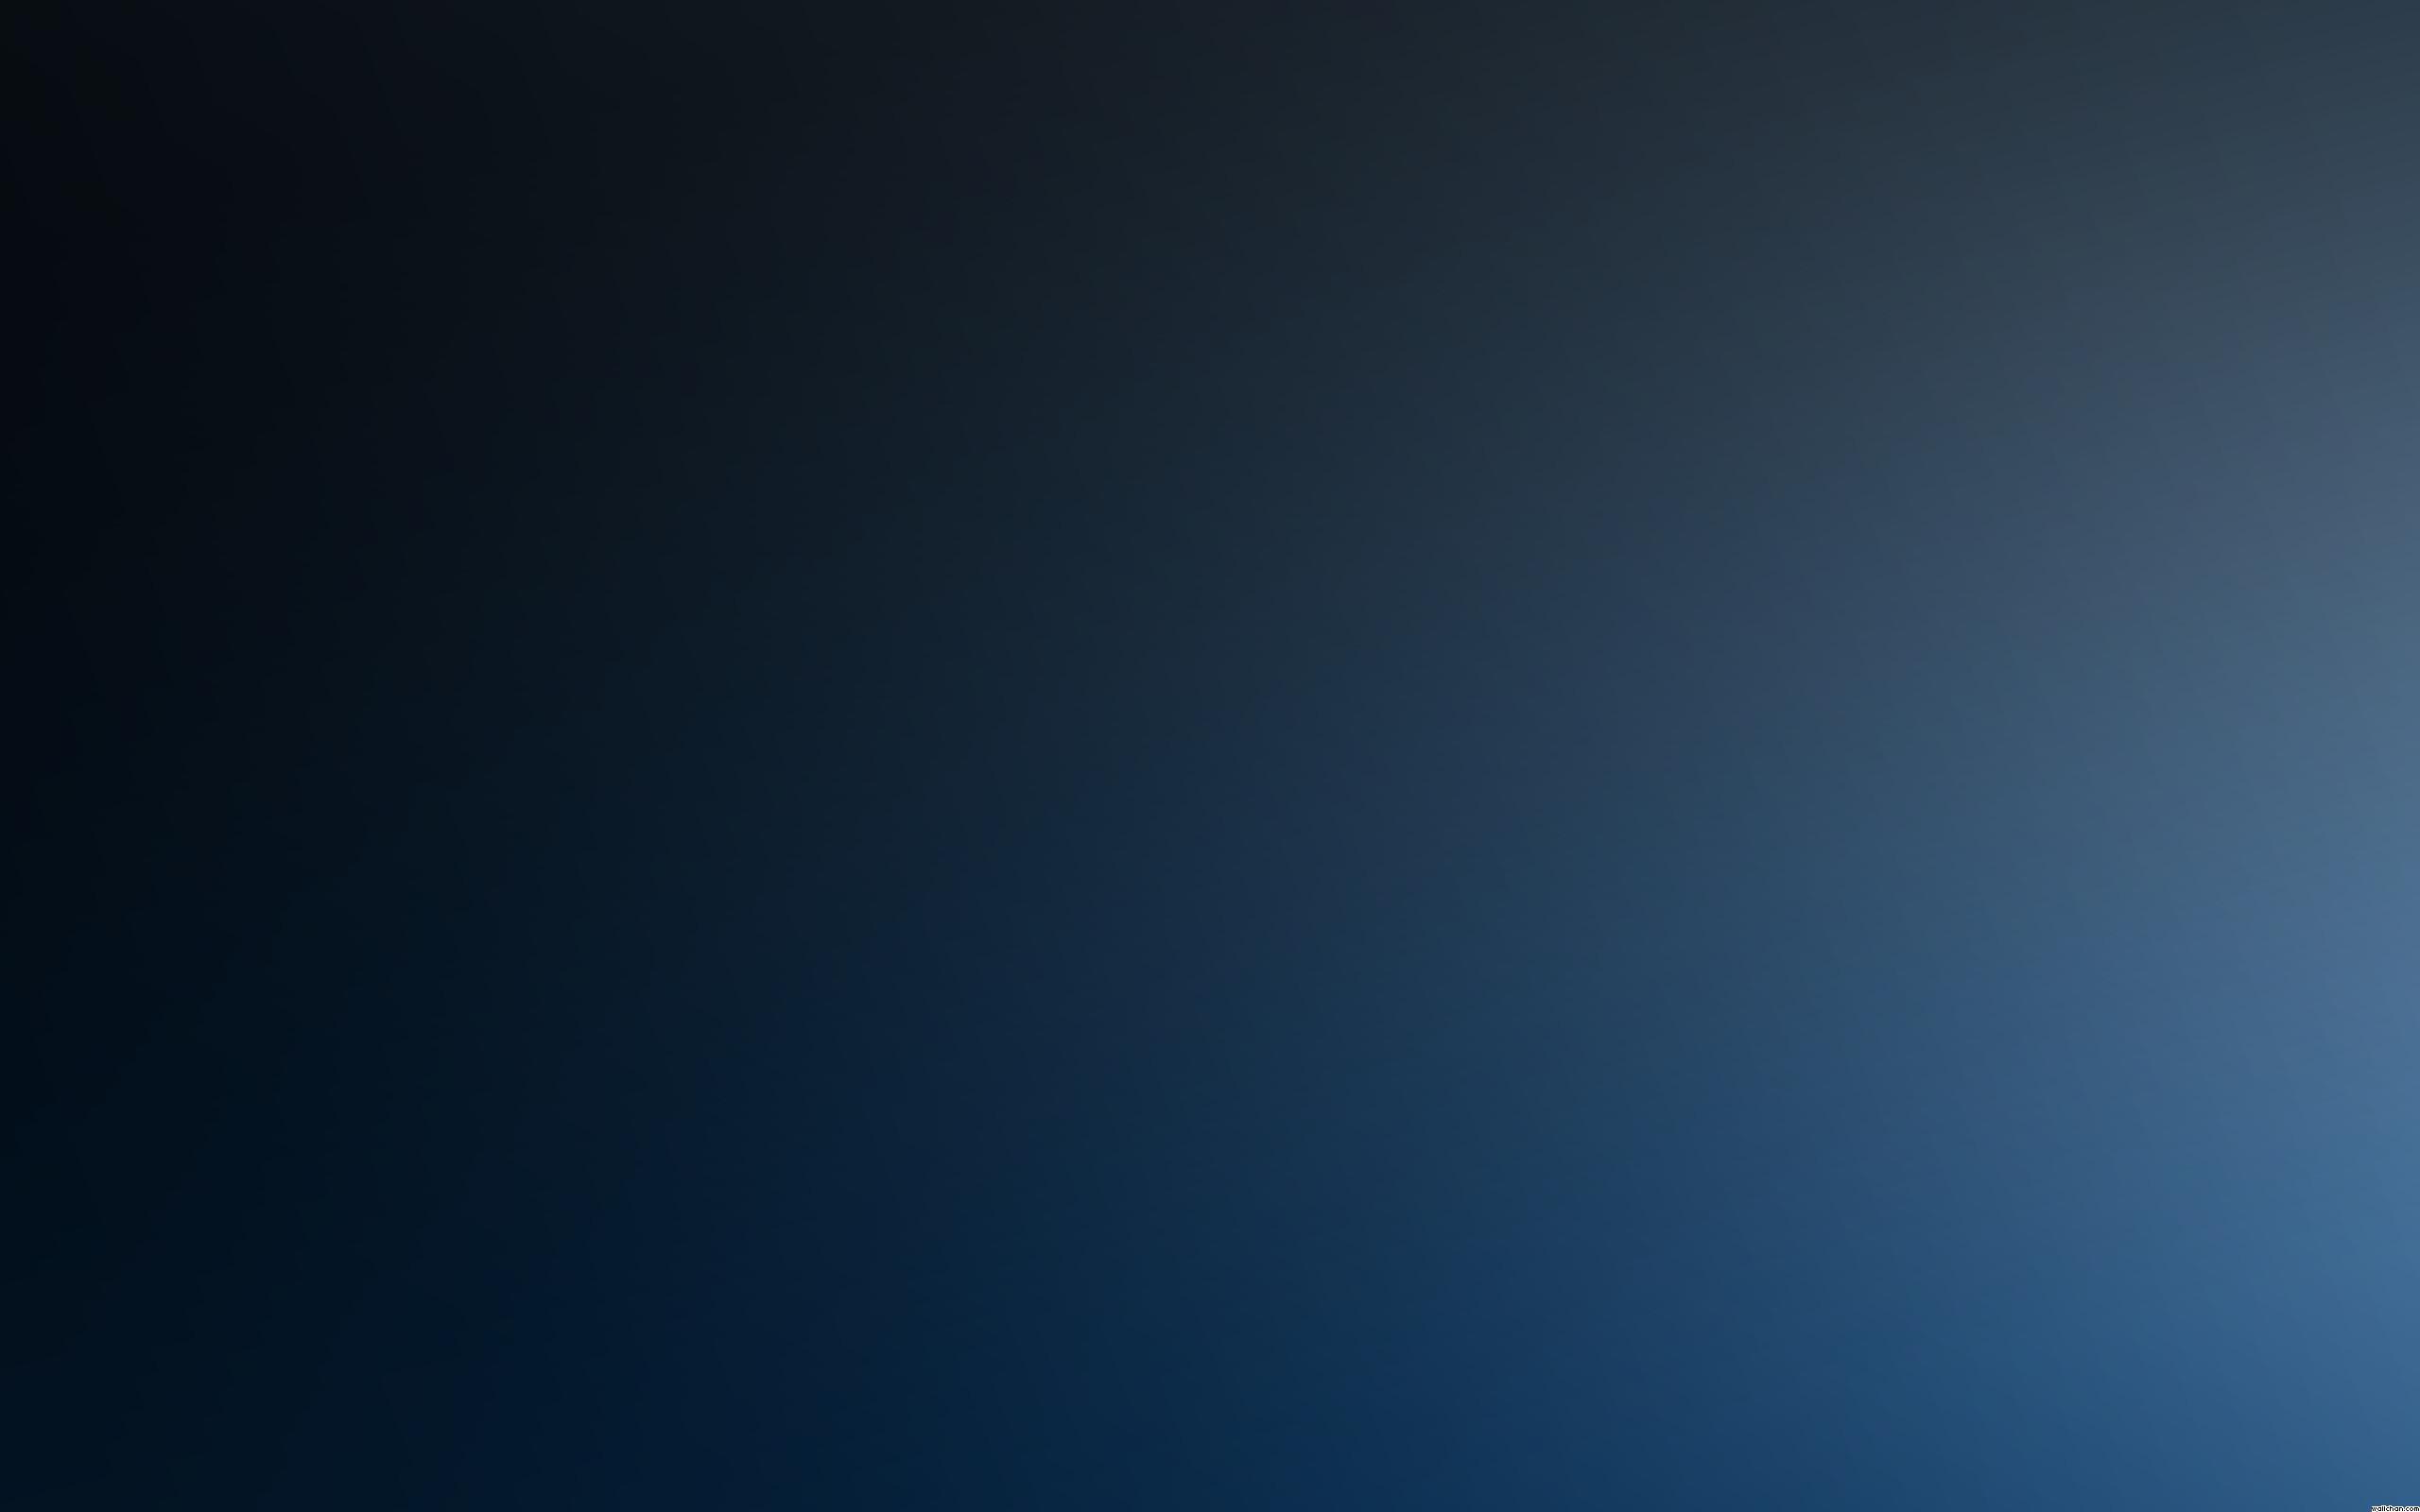 Dark Blue Wallpaper 42 Backgrounds Wallruru #9031